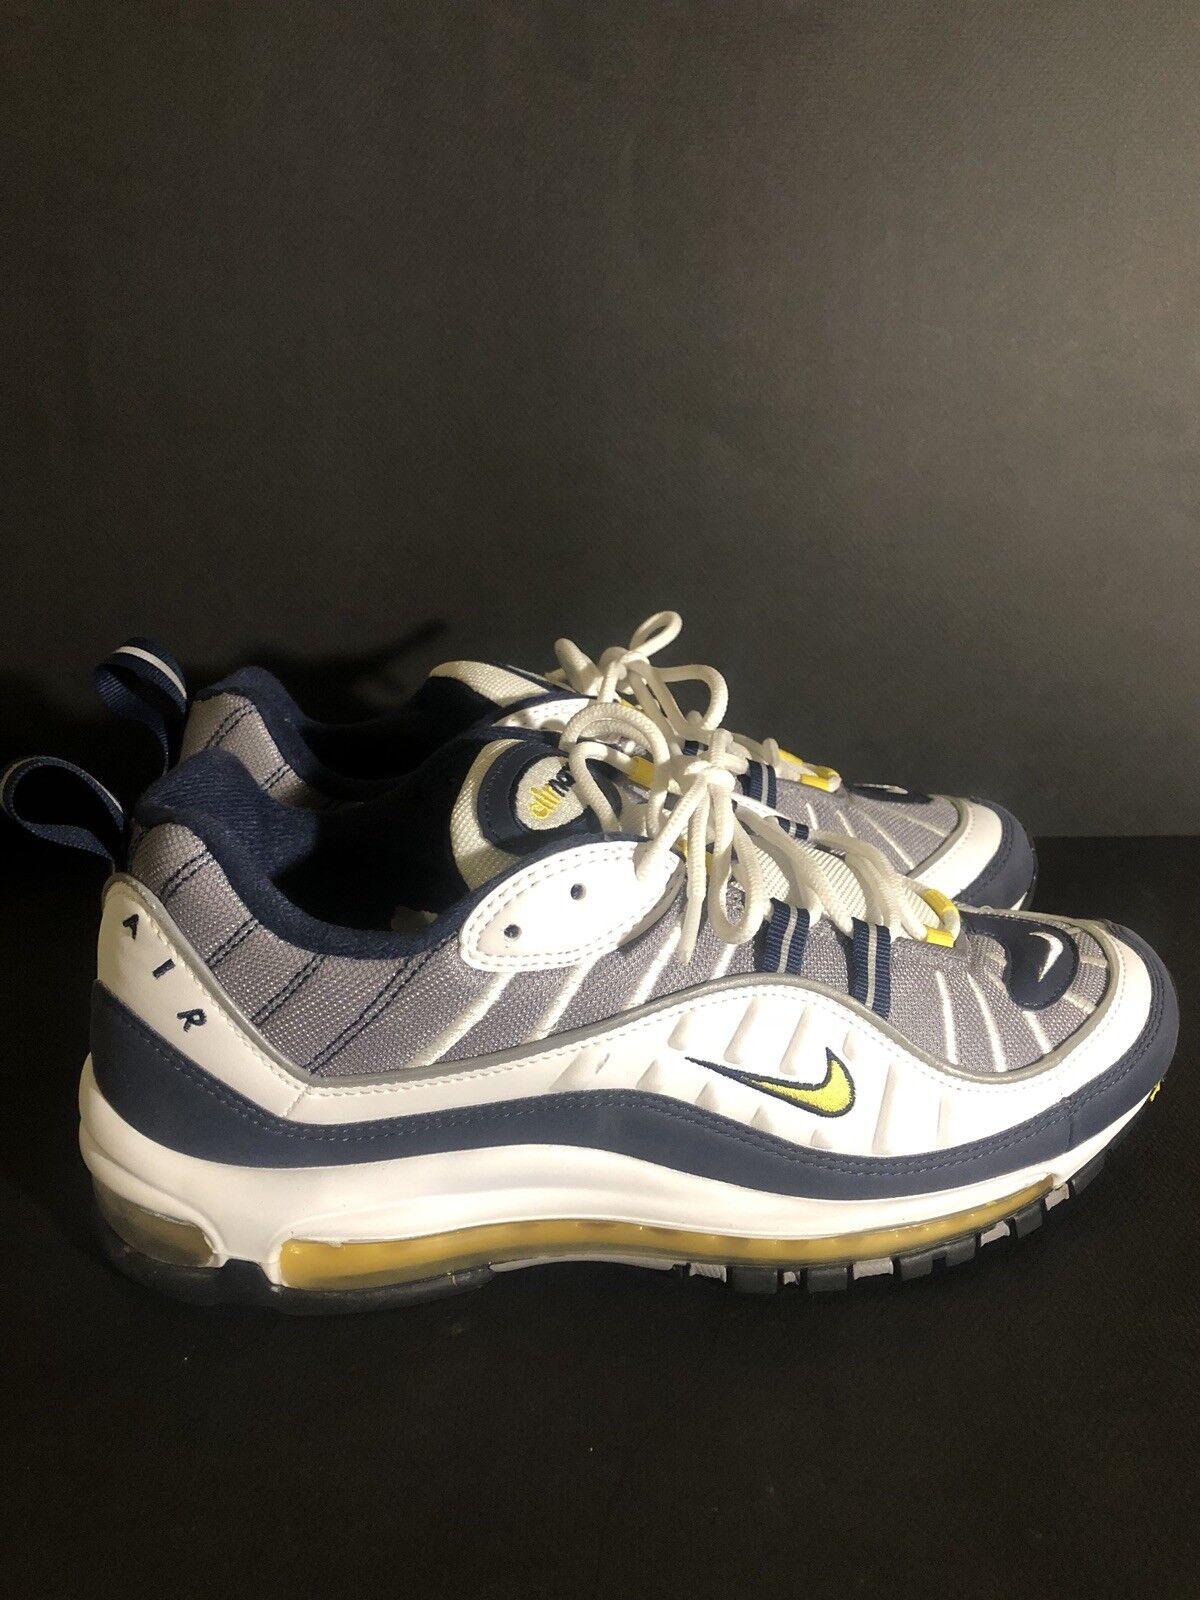 Nike Air Max 98 Tour Yellow | 640744 105